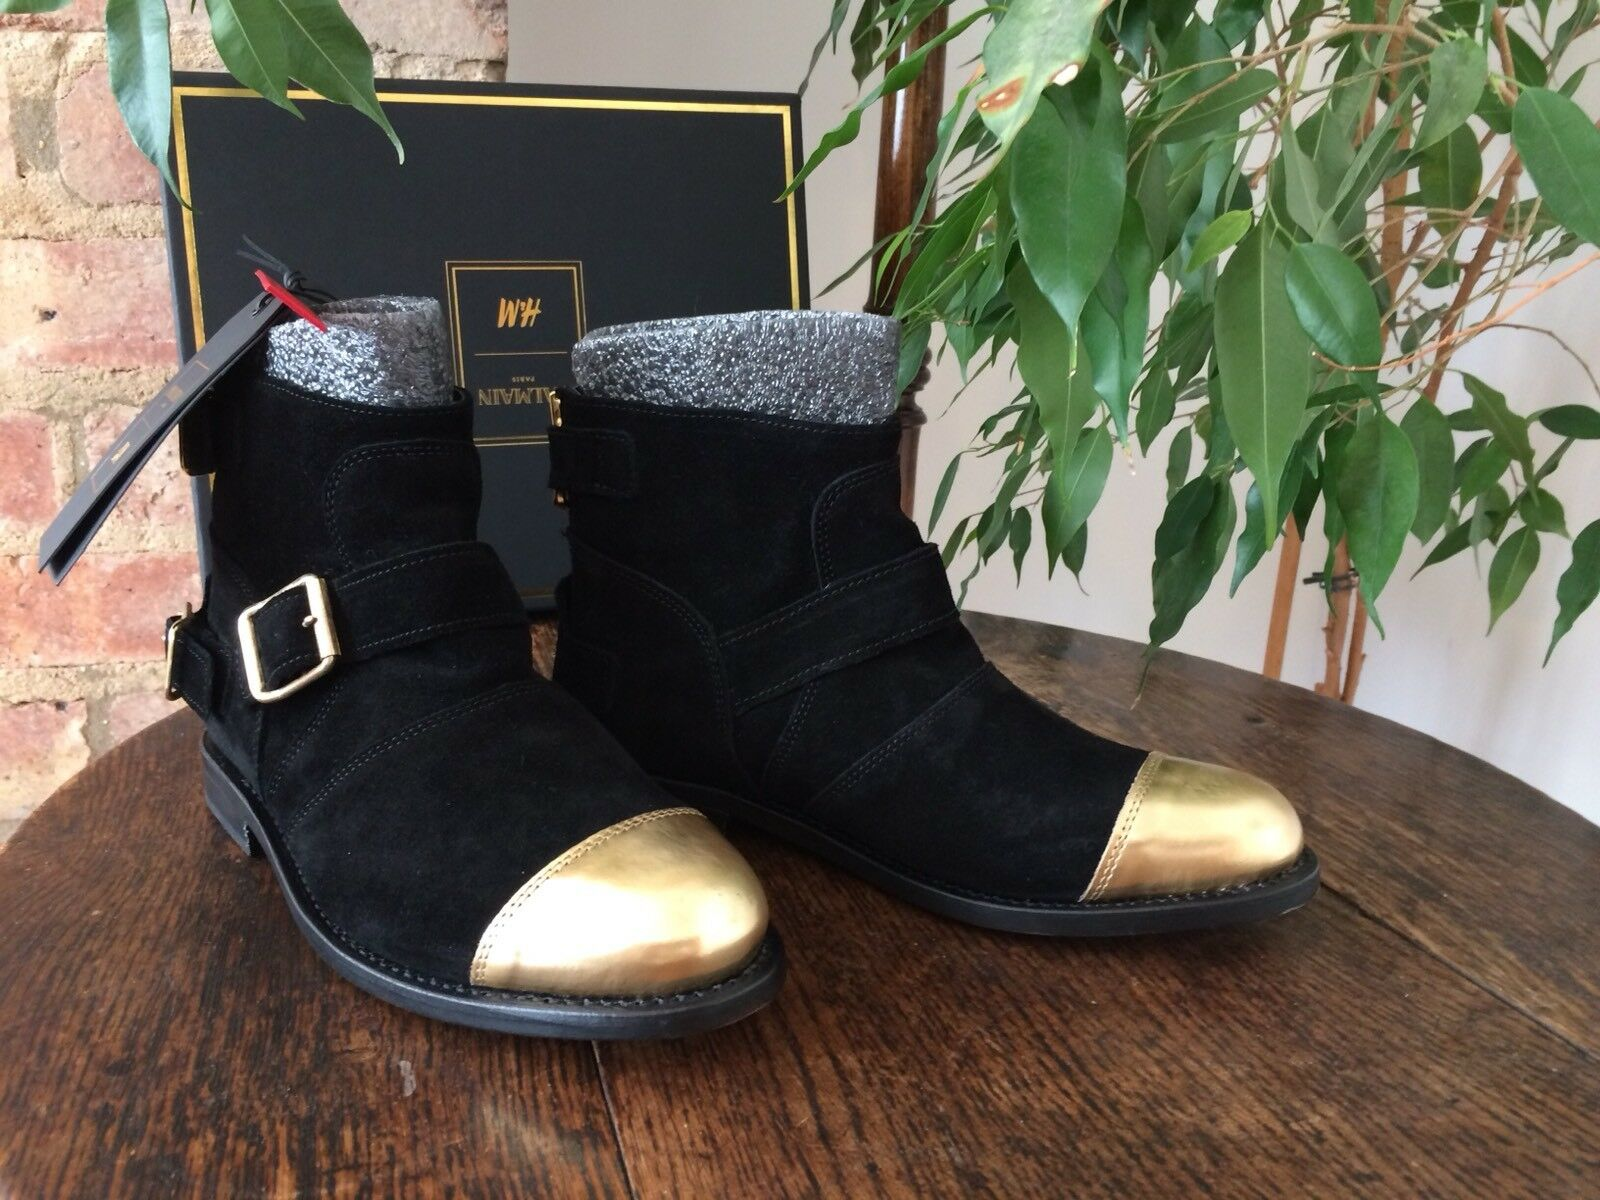 Balmain X H&M Negro Y Dorado Dorado Dorado Puntera botas De Gamuza UK 5 EUR 38  barato en alta calidad